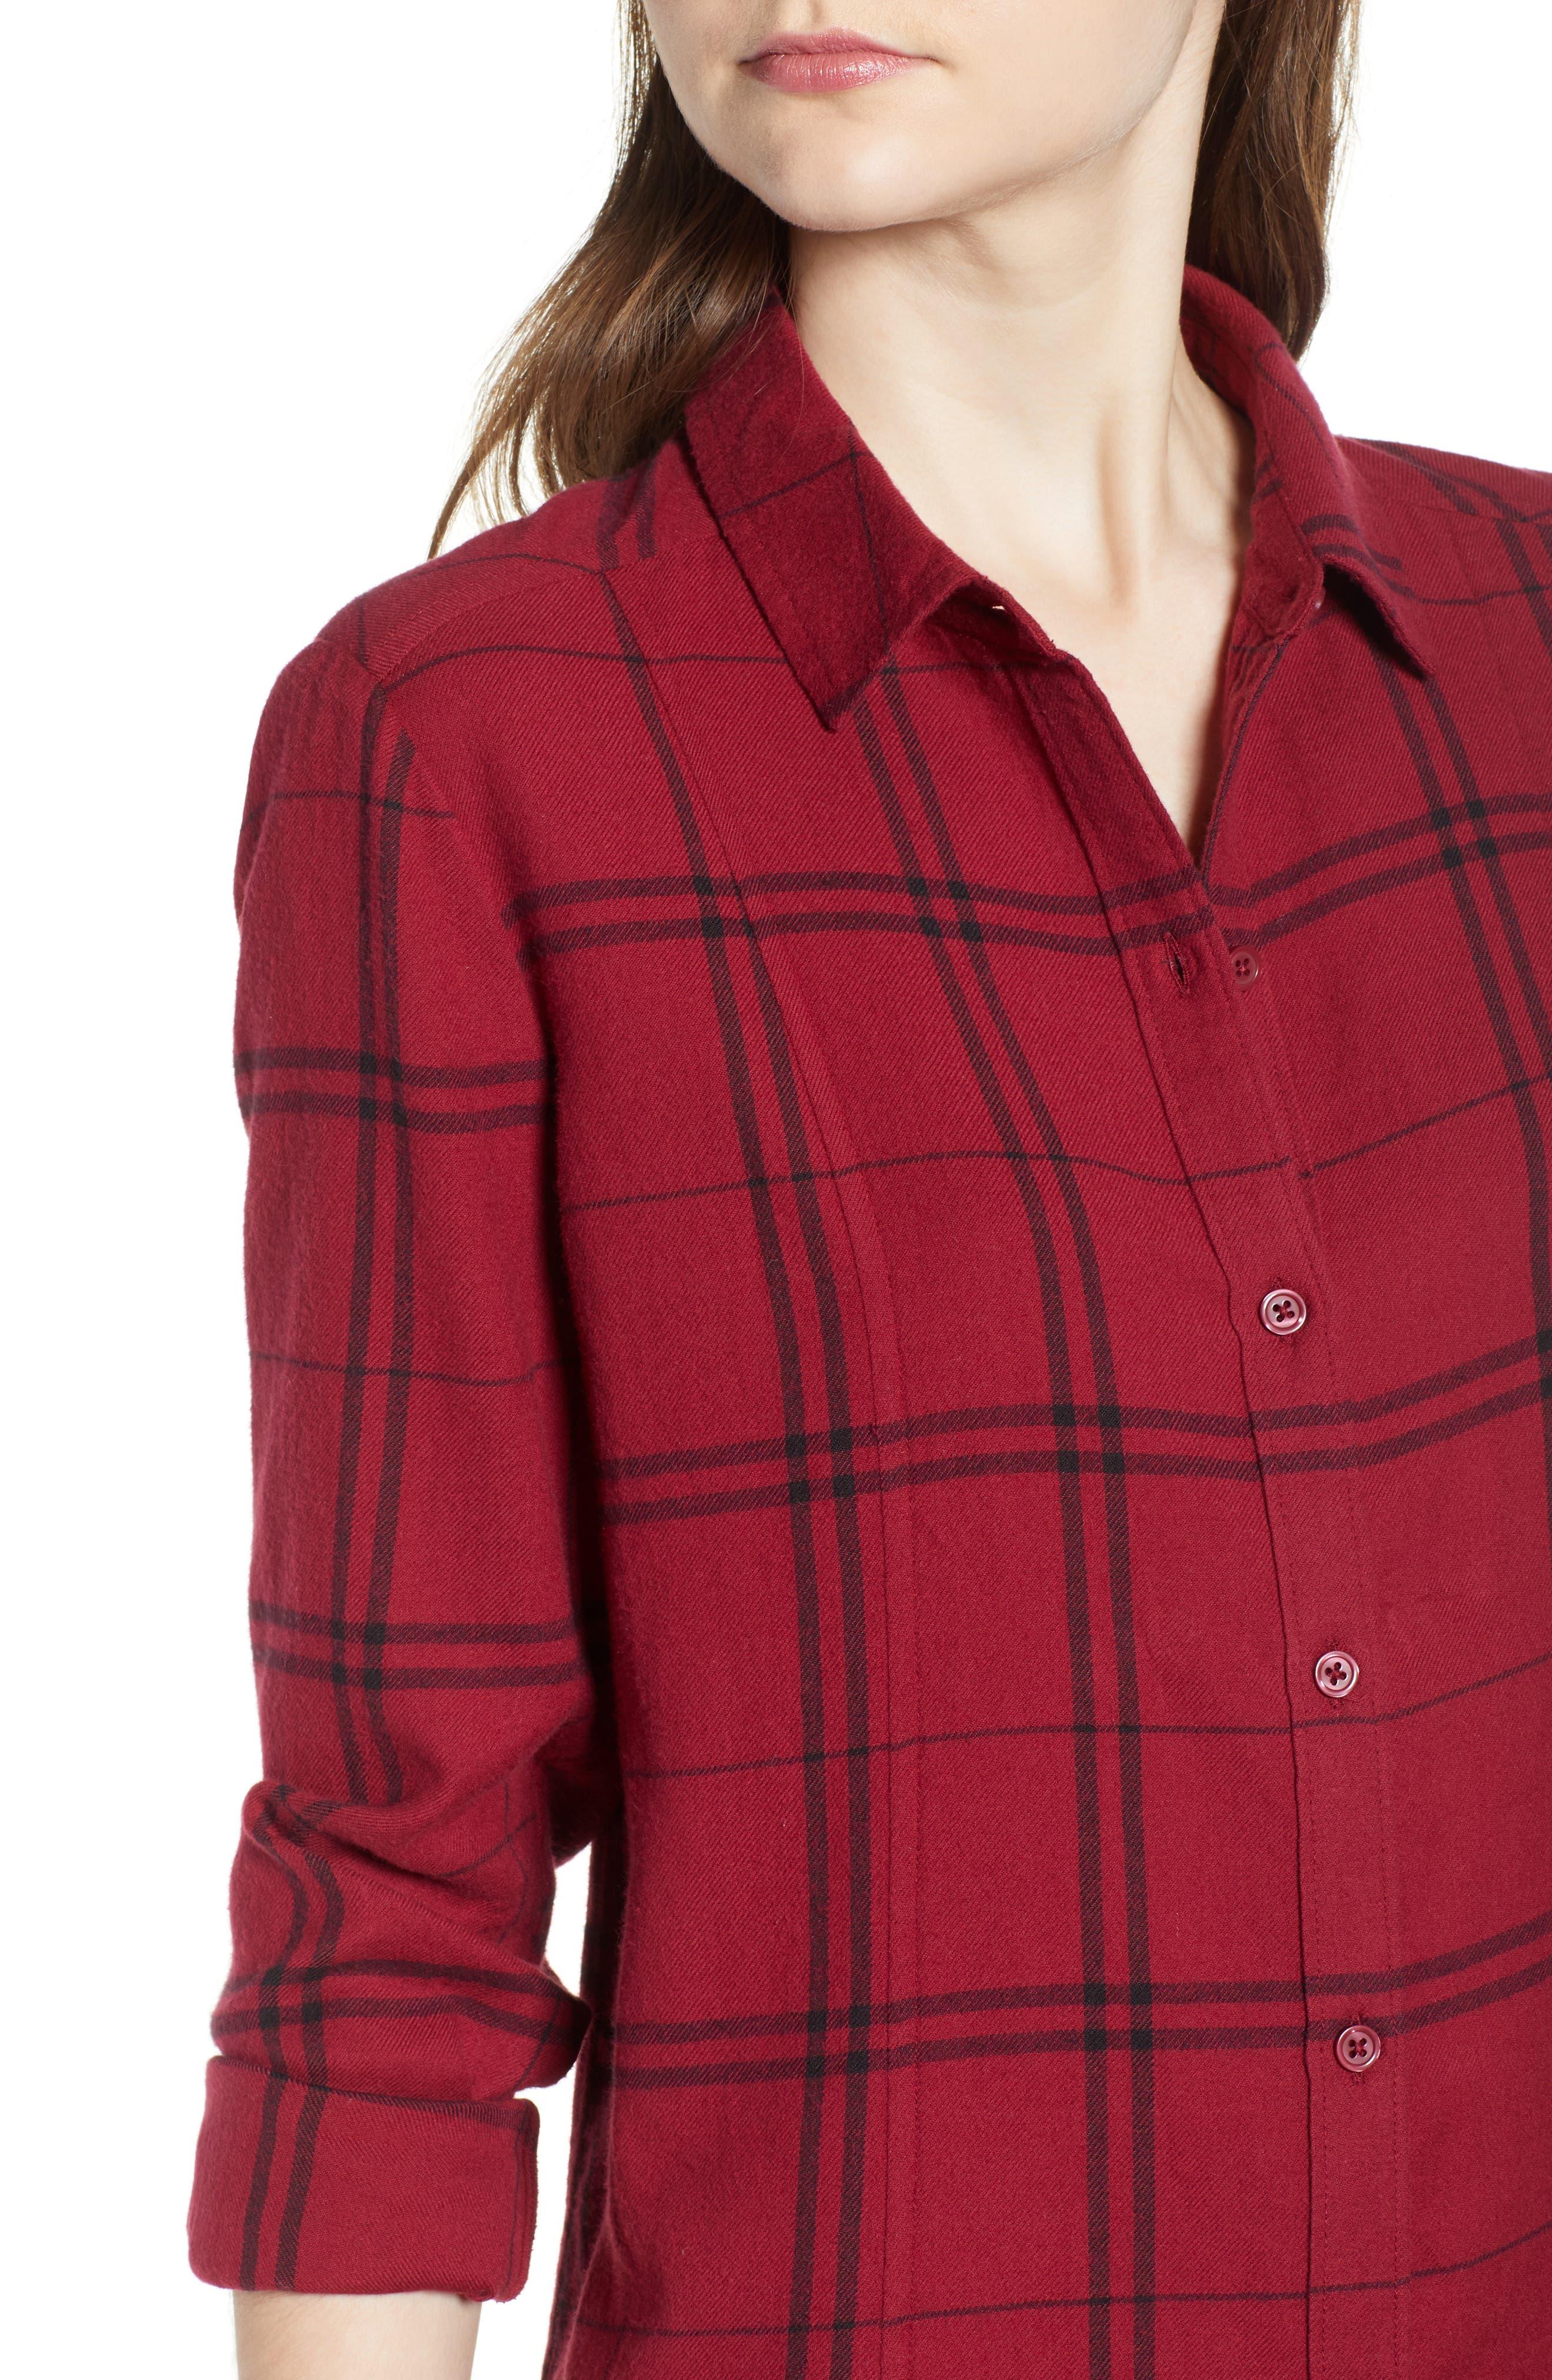 Plaid Shirt Dress,                             Alternate thumbnail 4, color,                             RED RUMBA SUNNY PLAID